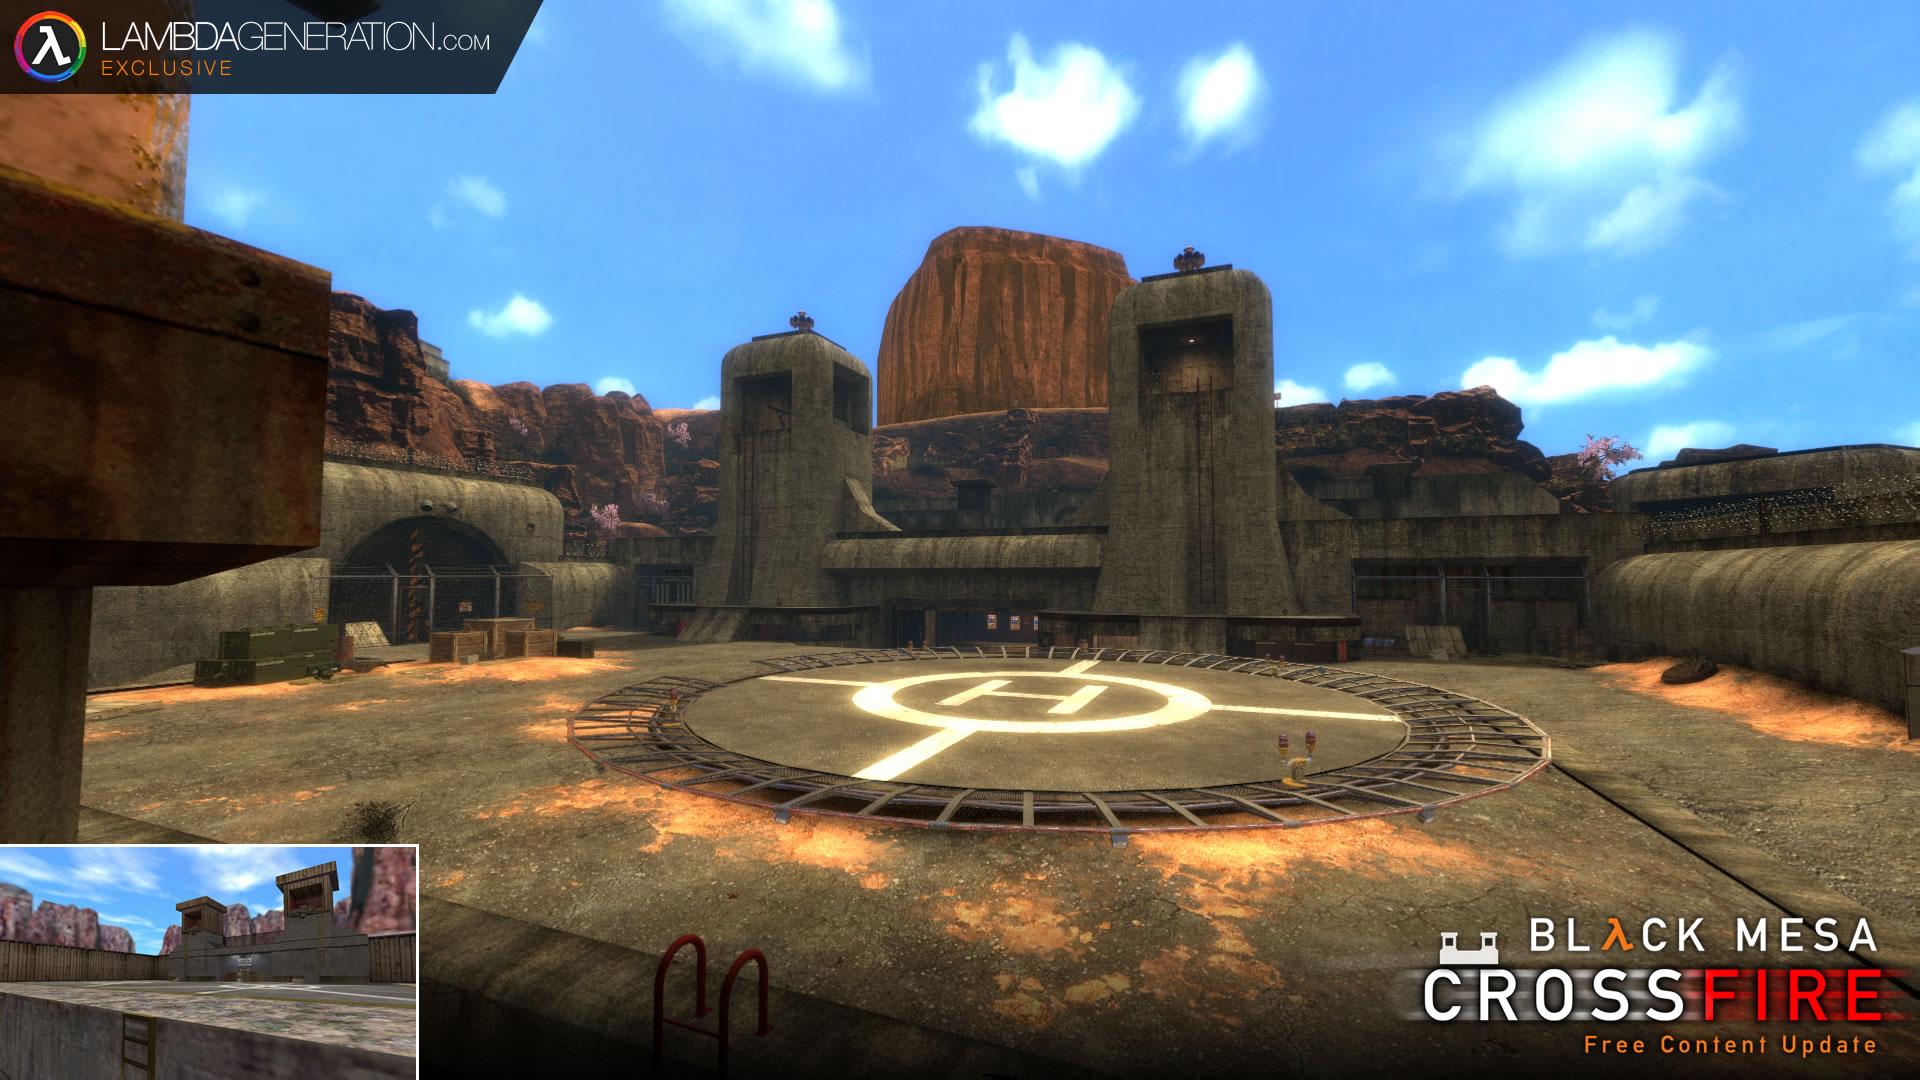 Black Mesa S Crossfire Update Half Life 2 Deathmatch Crossfire